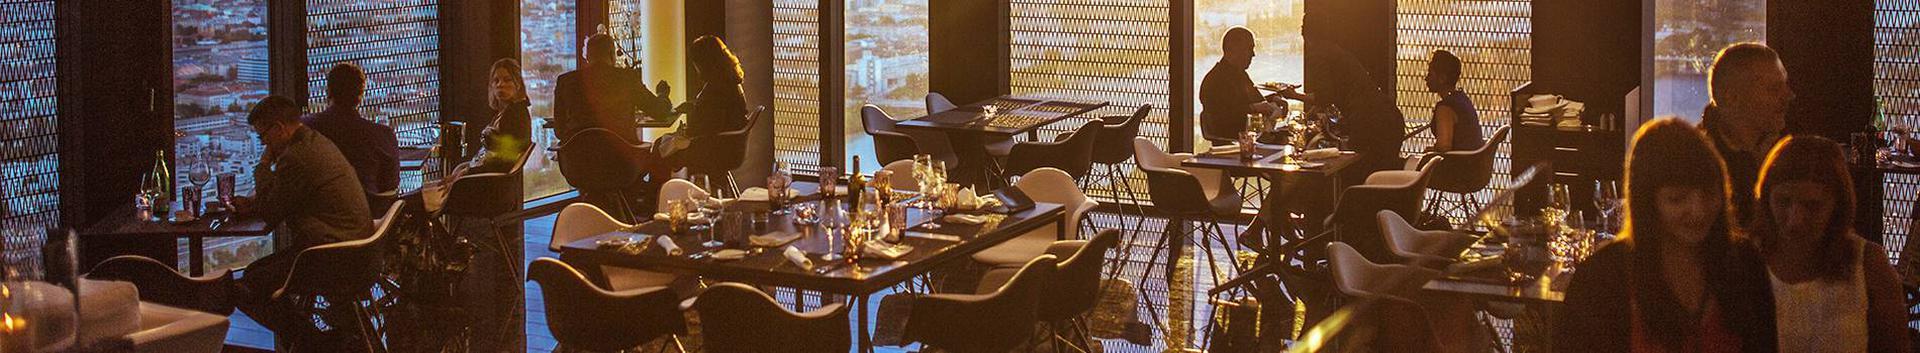 56101_toitlustus-restoran-jm-_31439115_xl.jpg